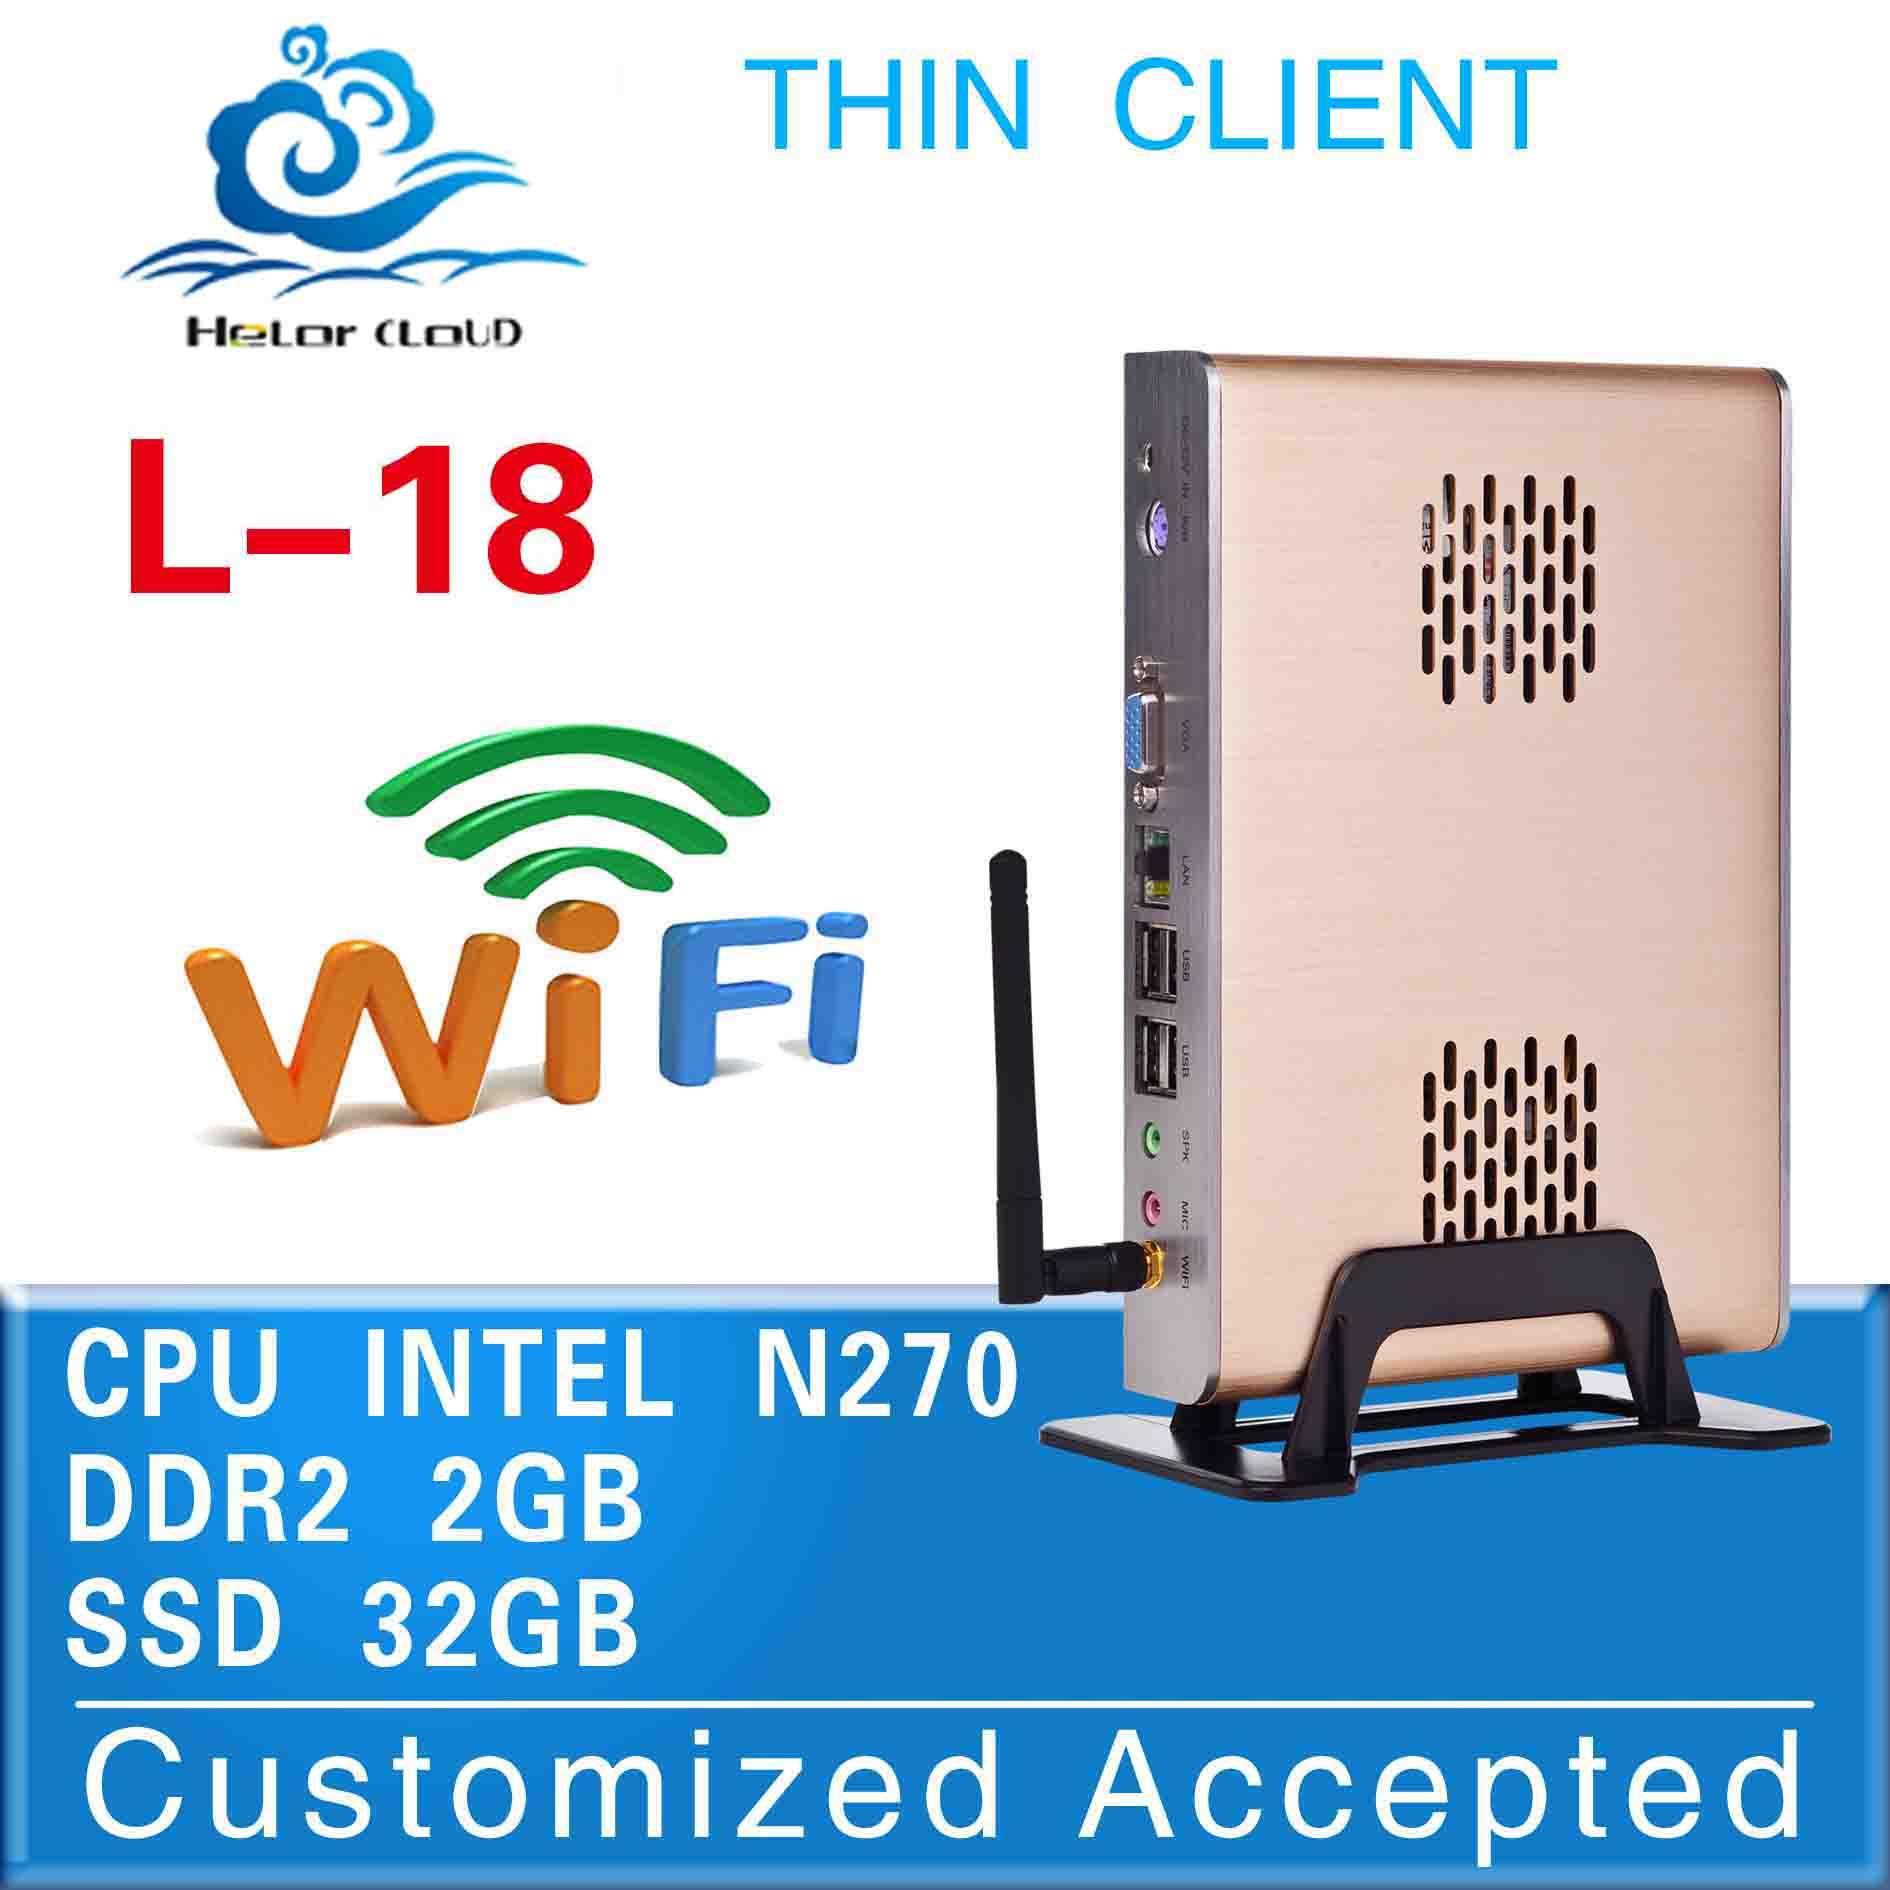 the cheapest good quality mini pc l-18 intel atom n270 network fanless desktop 2g ram 32g ssd mini industrial pc thin client(China (Mainland))